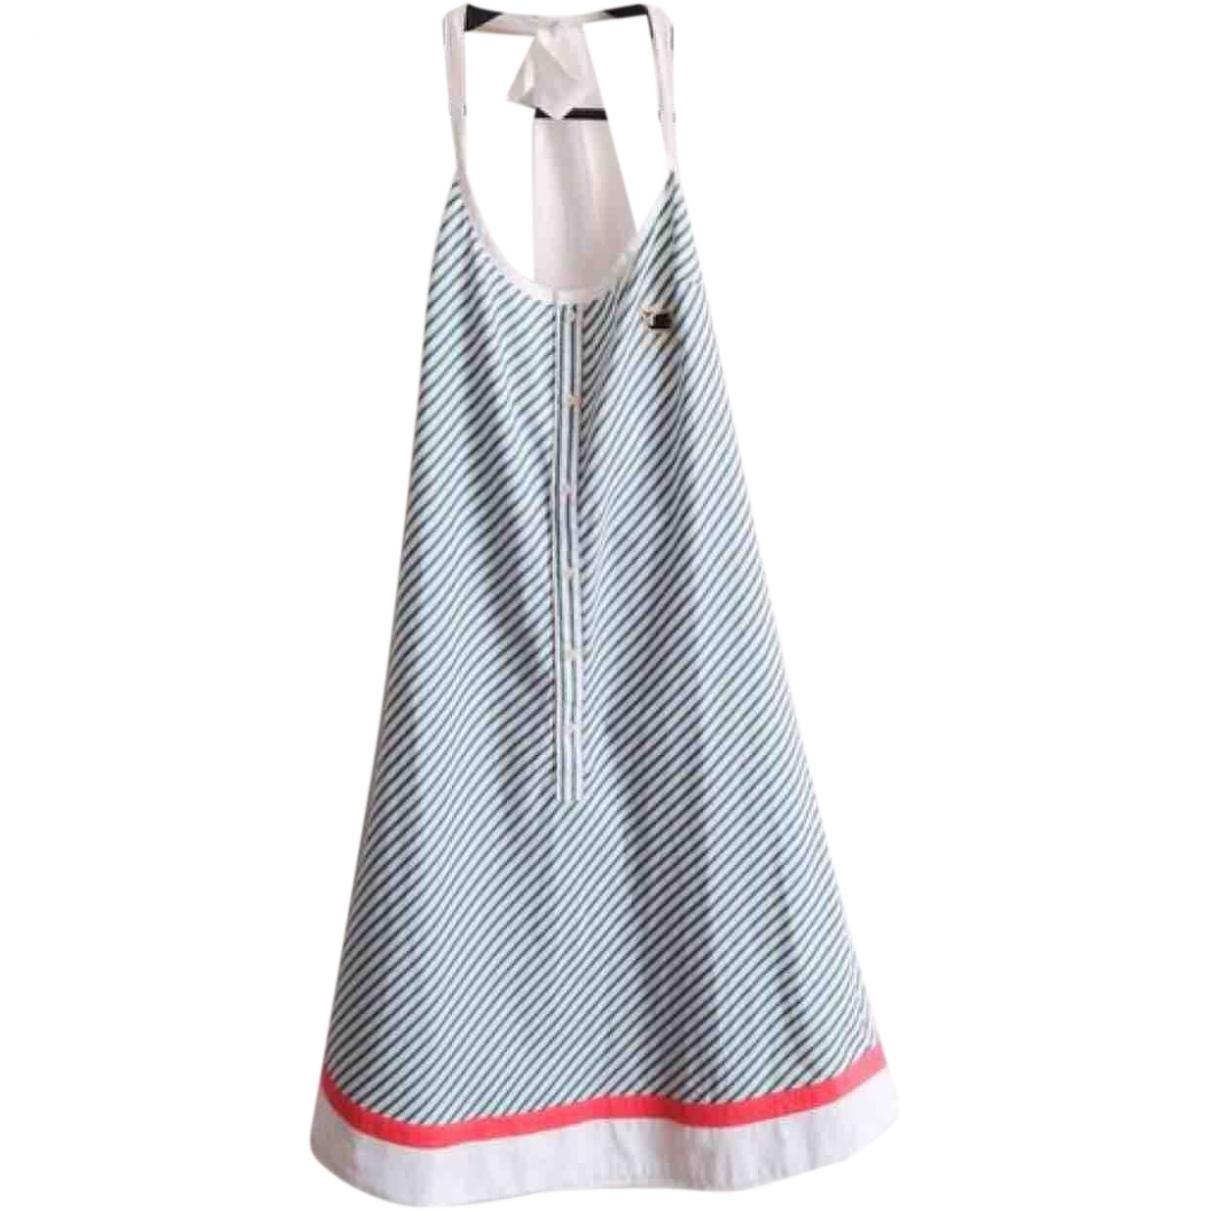 Dsquared2 \N Cotton dress for Women 44 IT